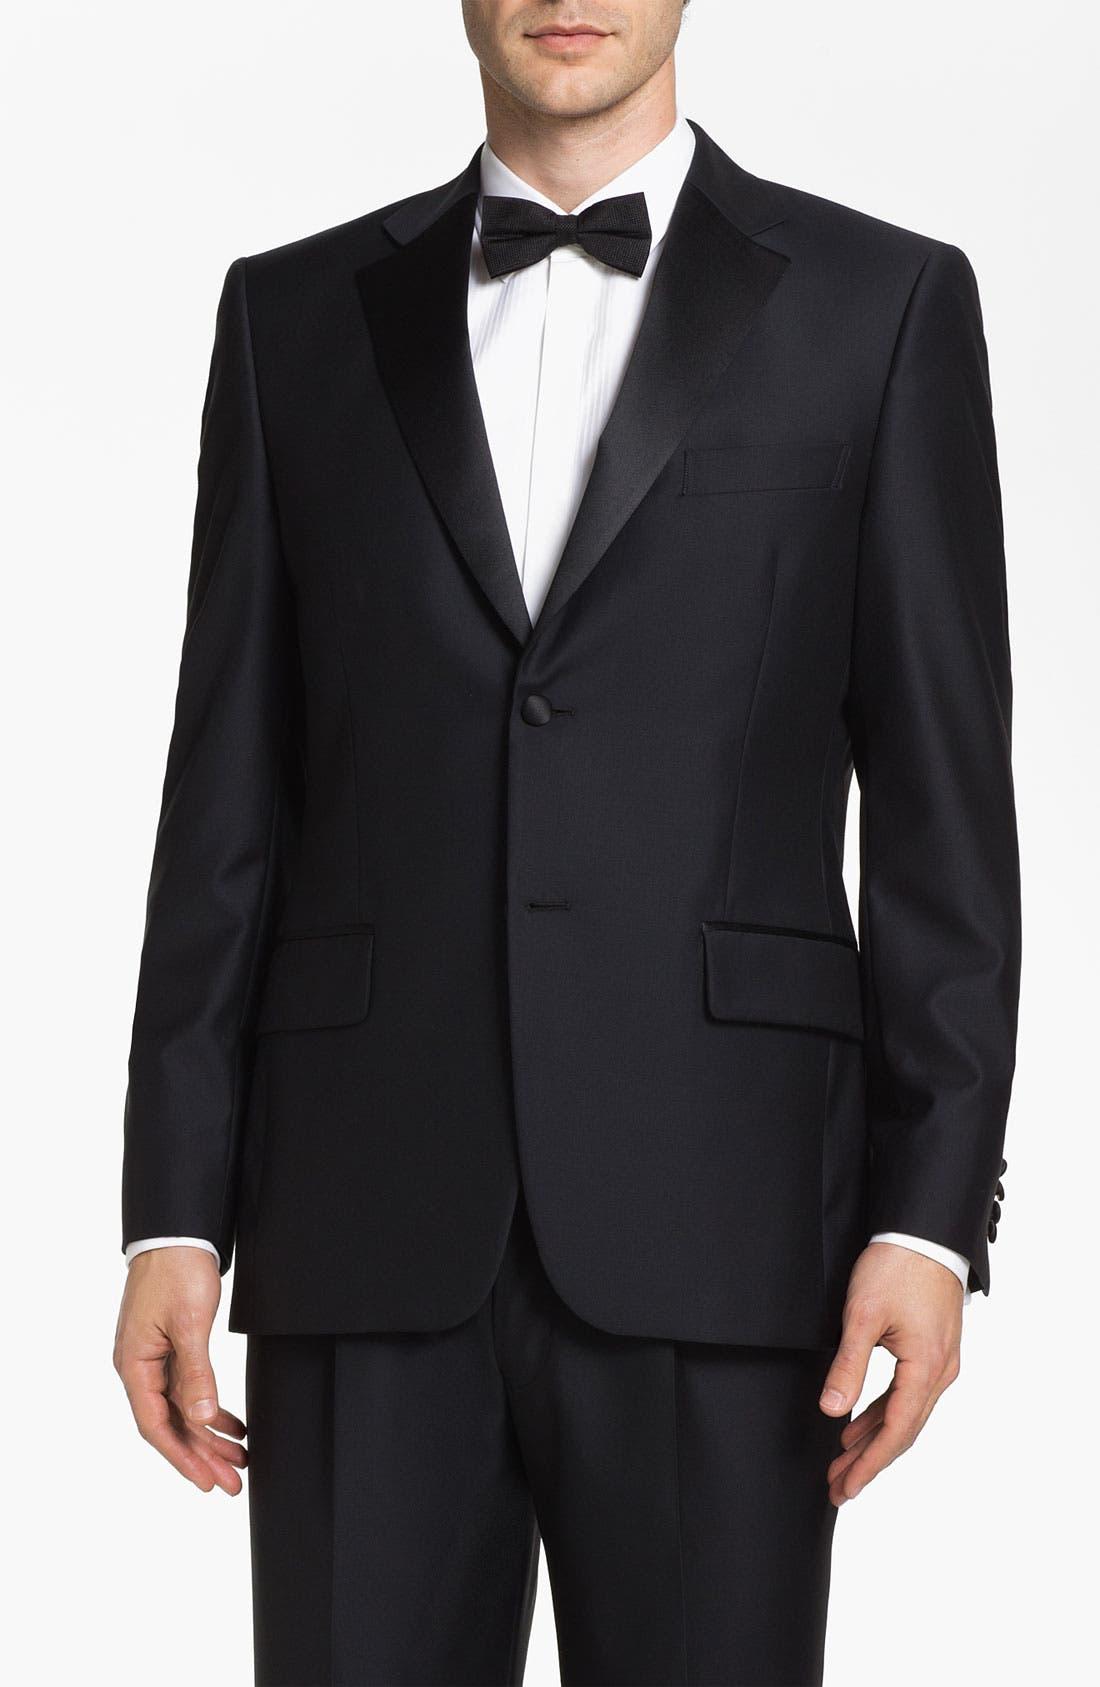 Alternate Image 1 Selected - John W. Nordstrom® Signature Wool Dinner Jacket